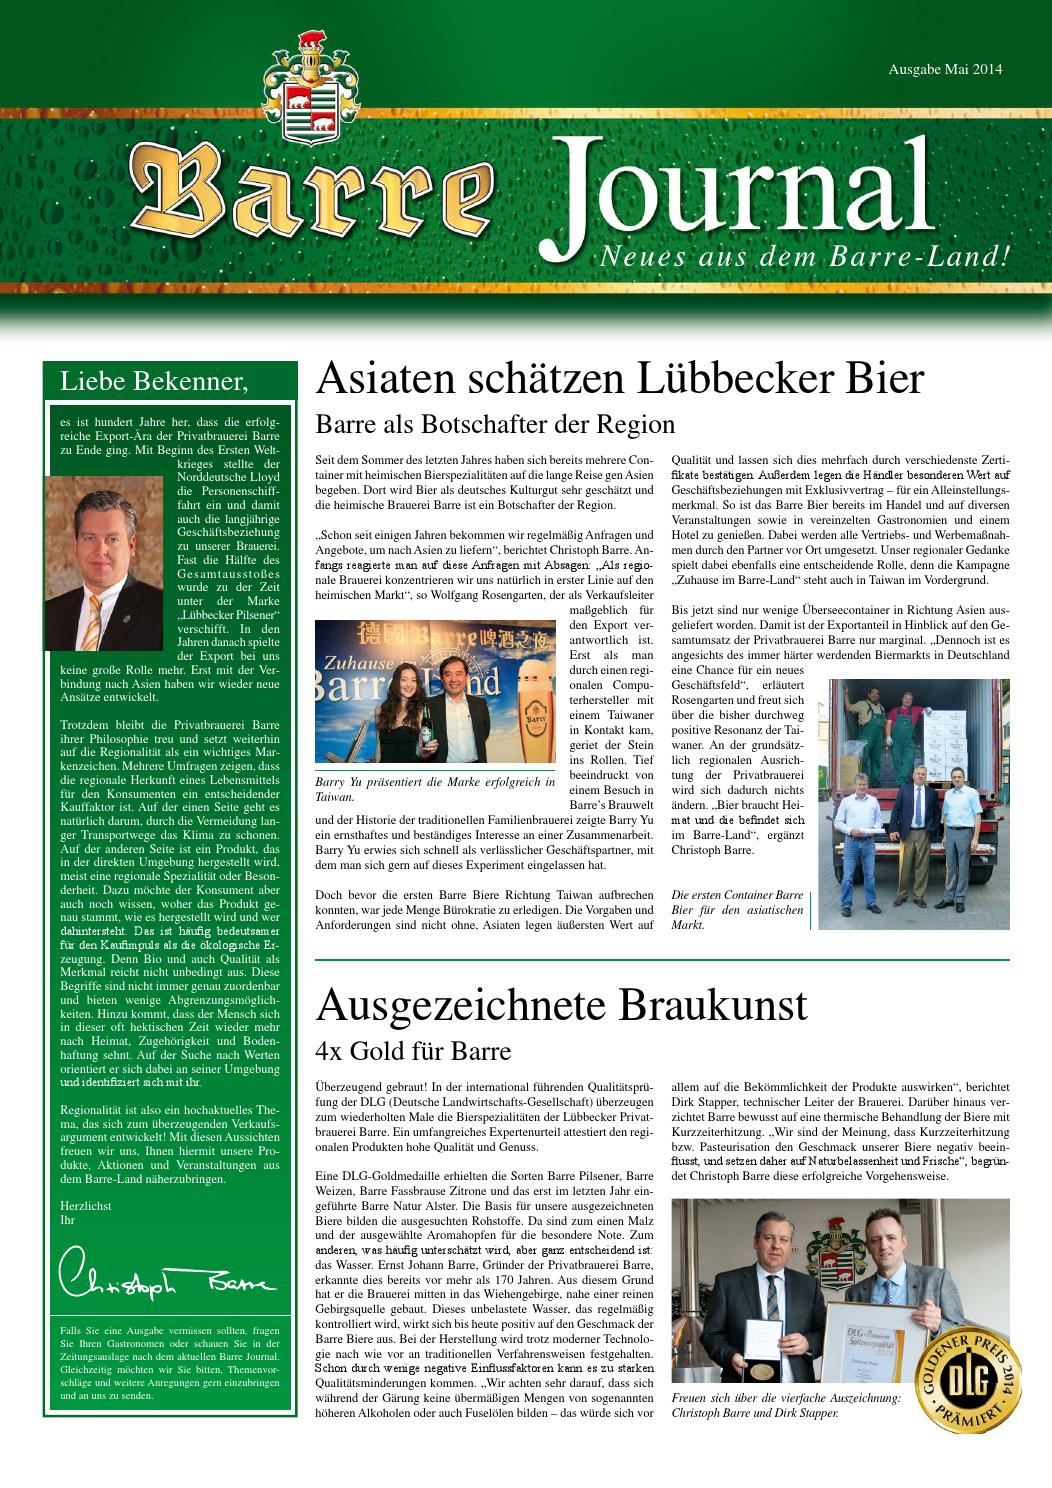 Barre Journal Mai 2014 by Privatbrauerei Barre - issuu